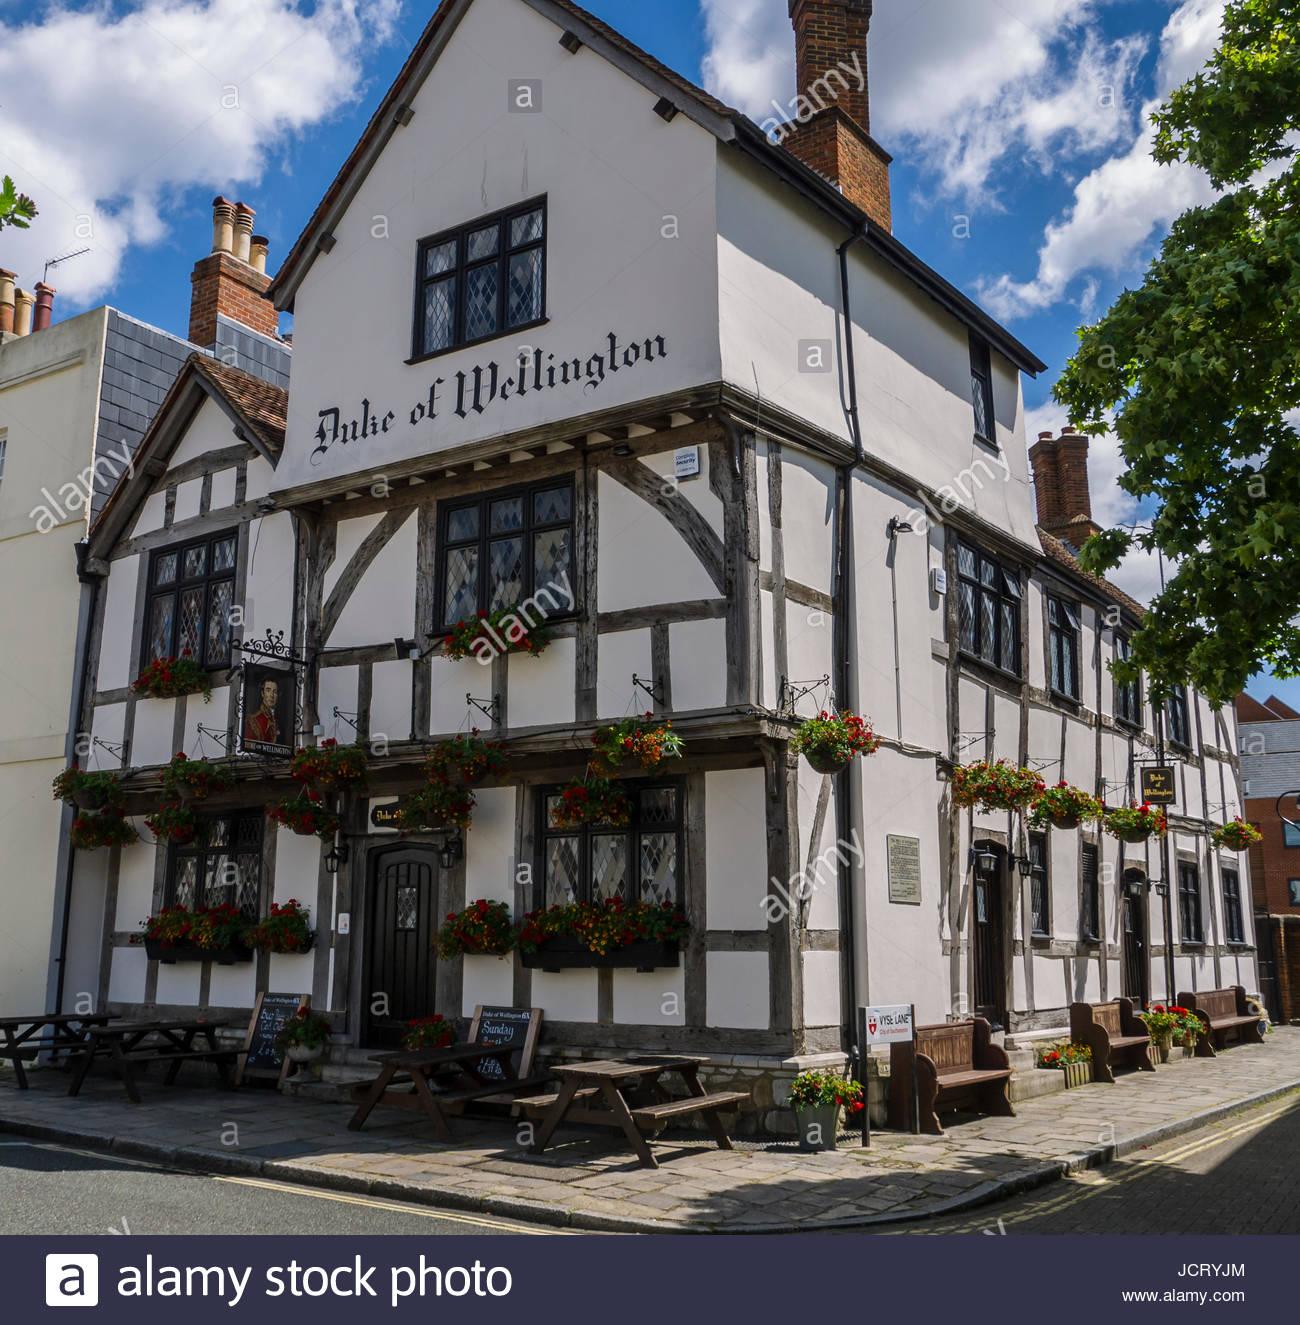 Duke of Wellington Pub Southampton Hampshire England - Stock Image